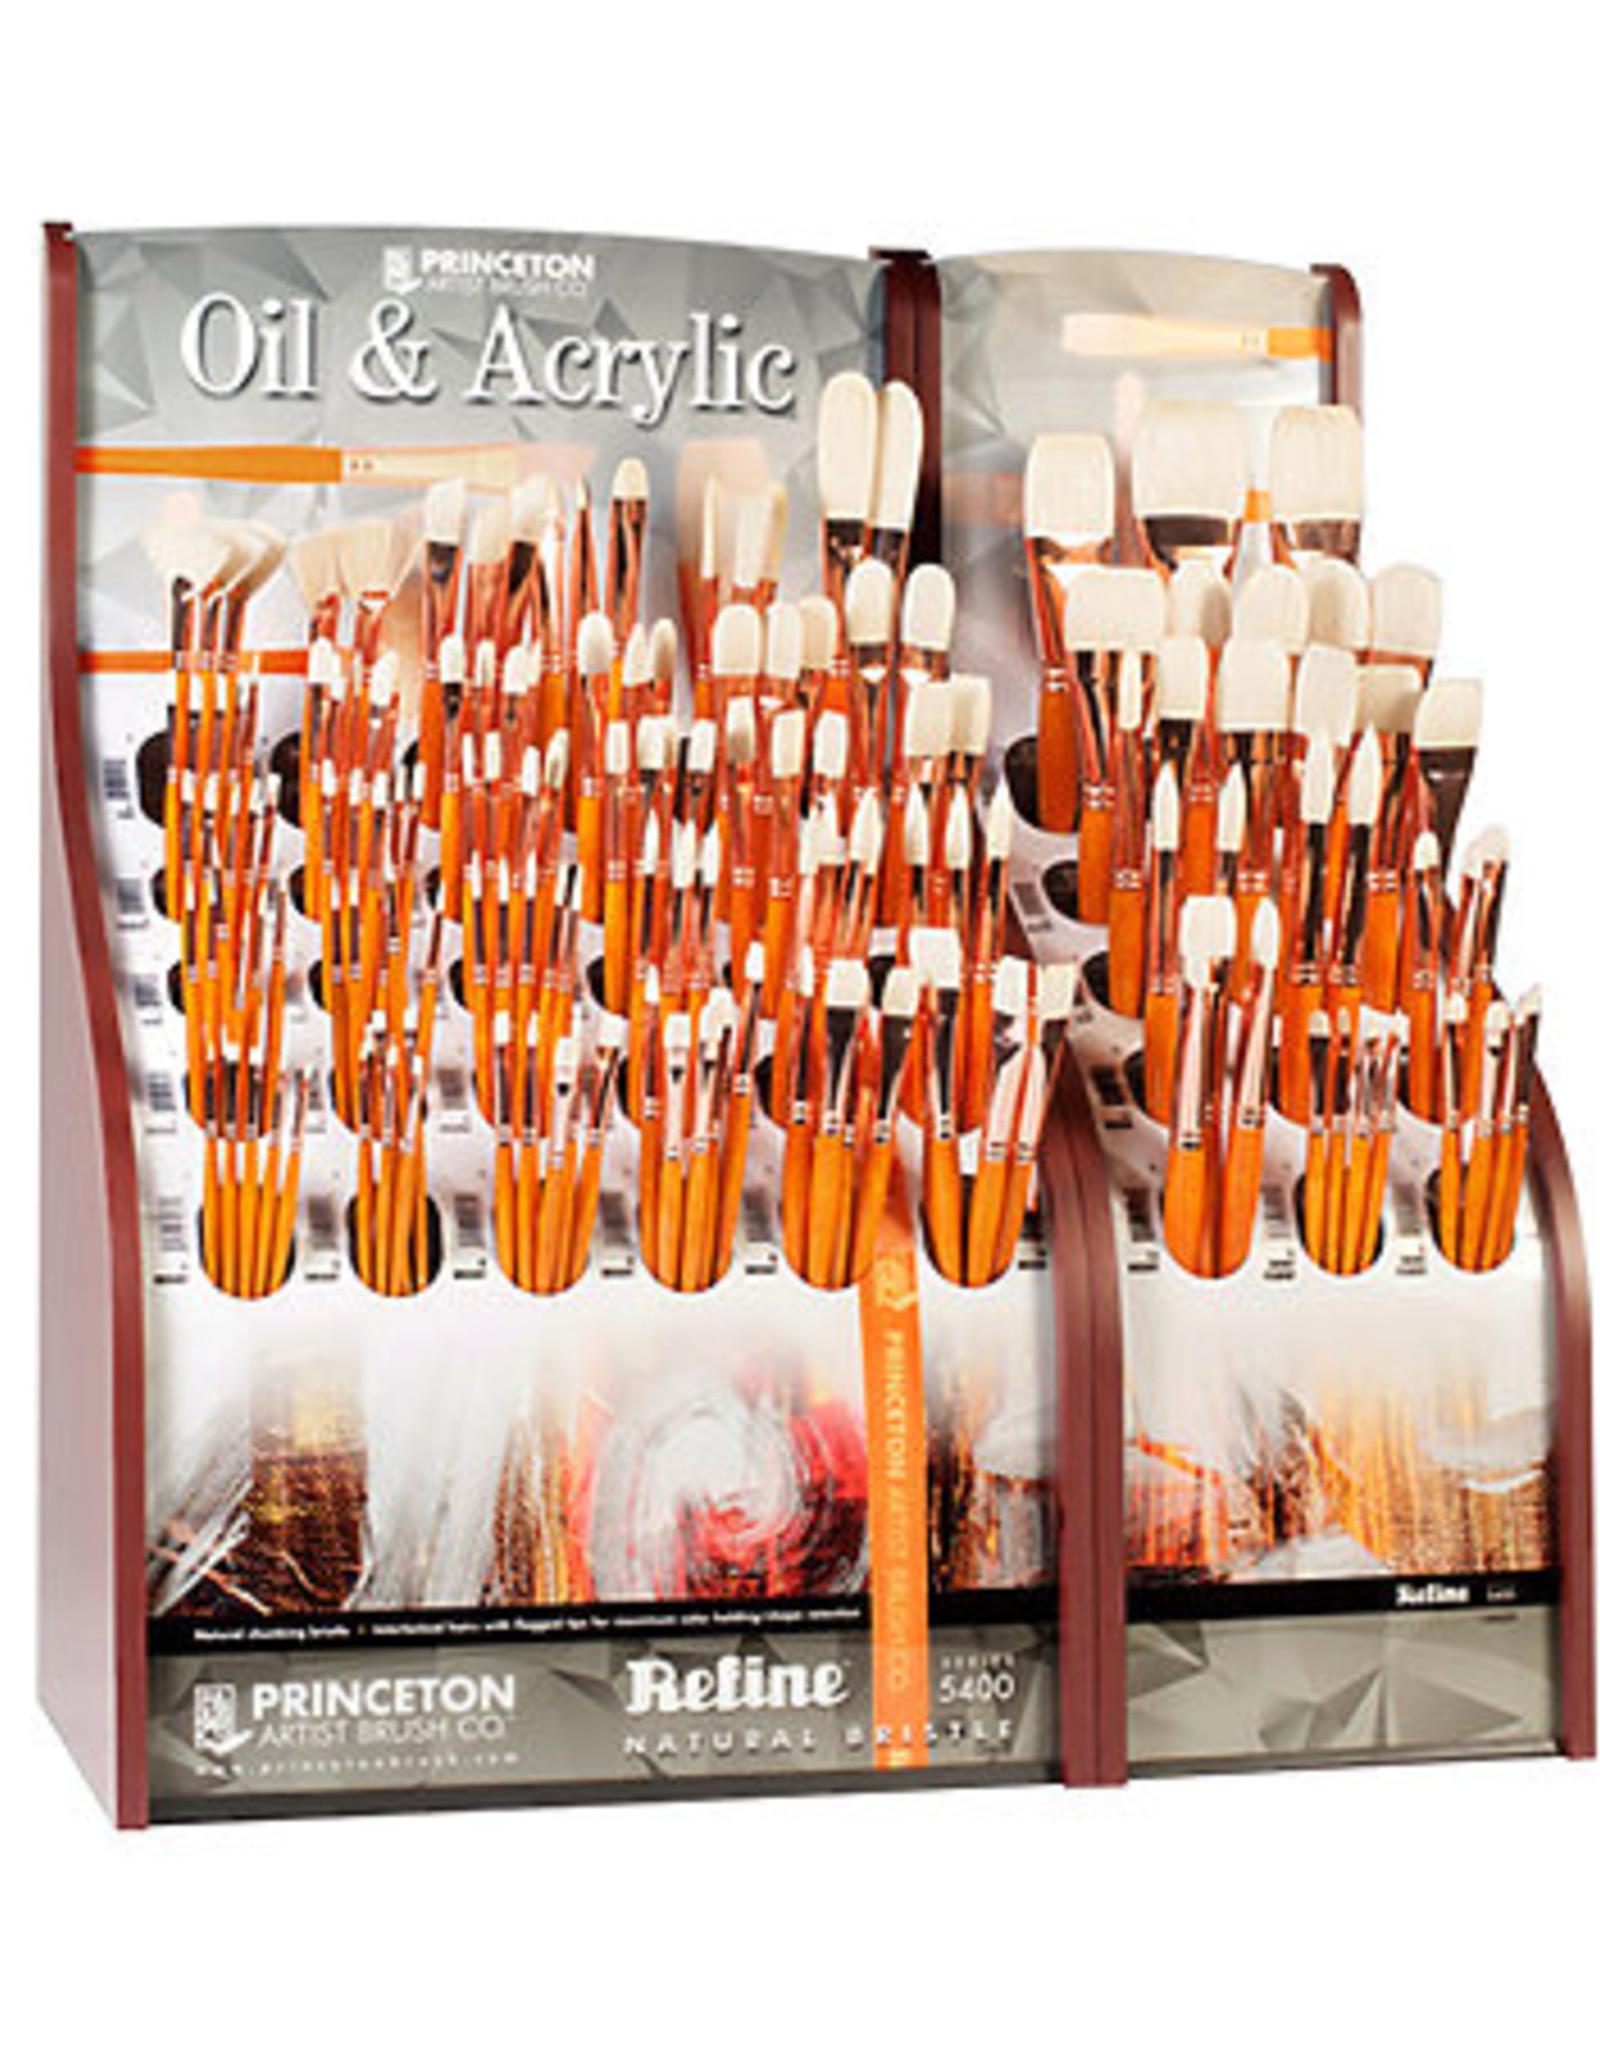 Princeton Art & Brush Co Refine Natural Bristle Brush Bright